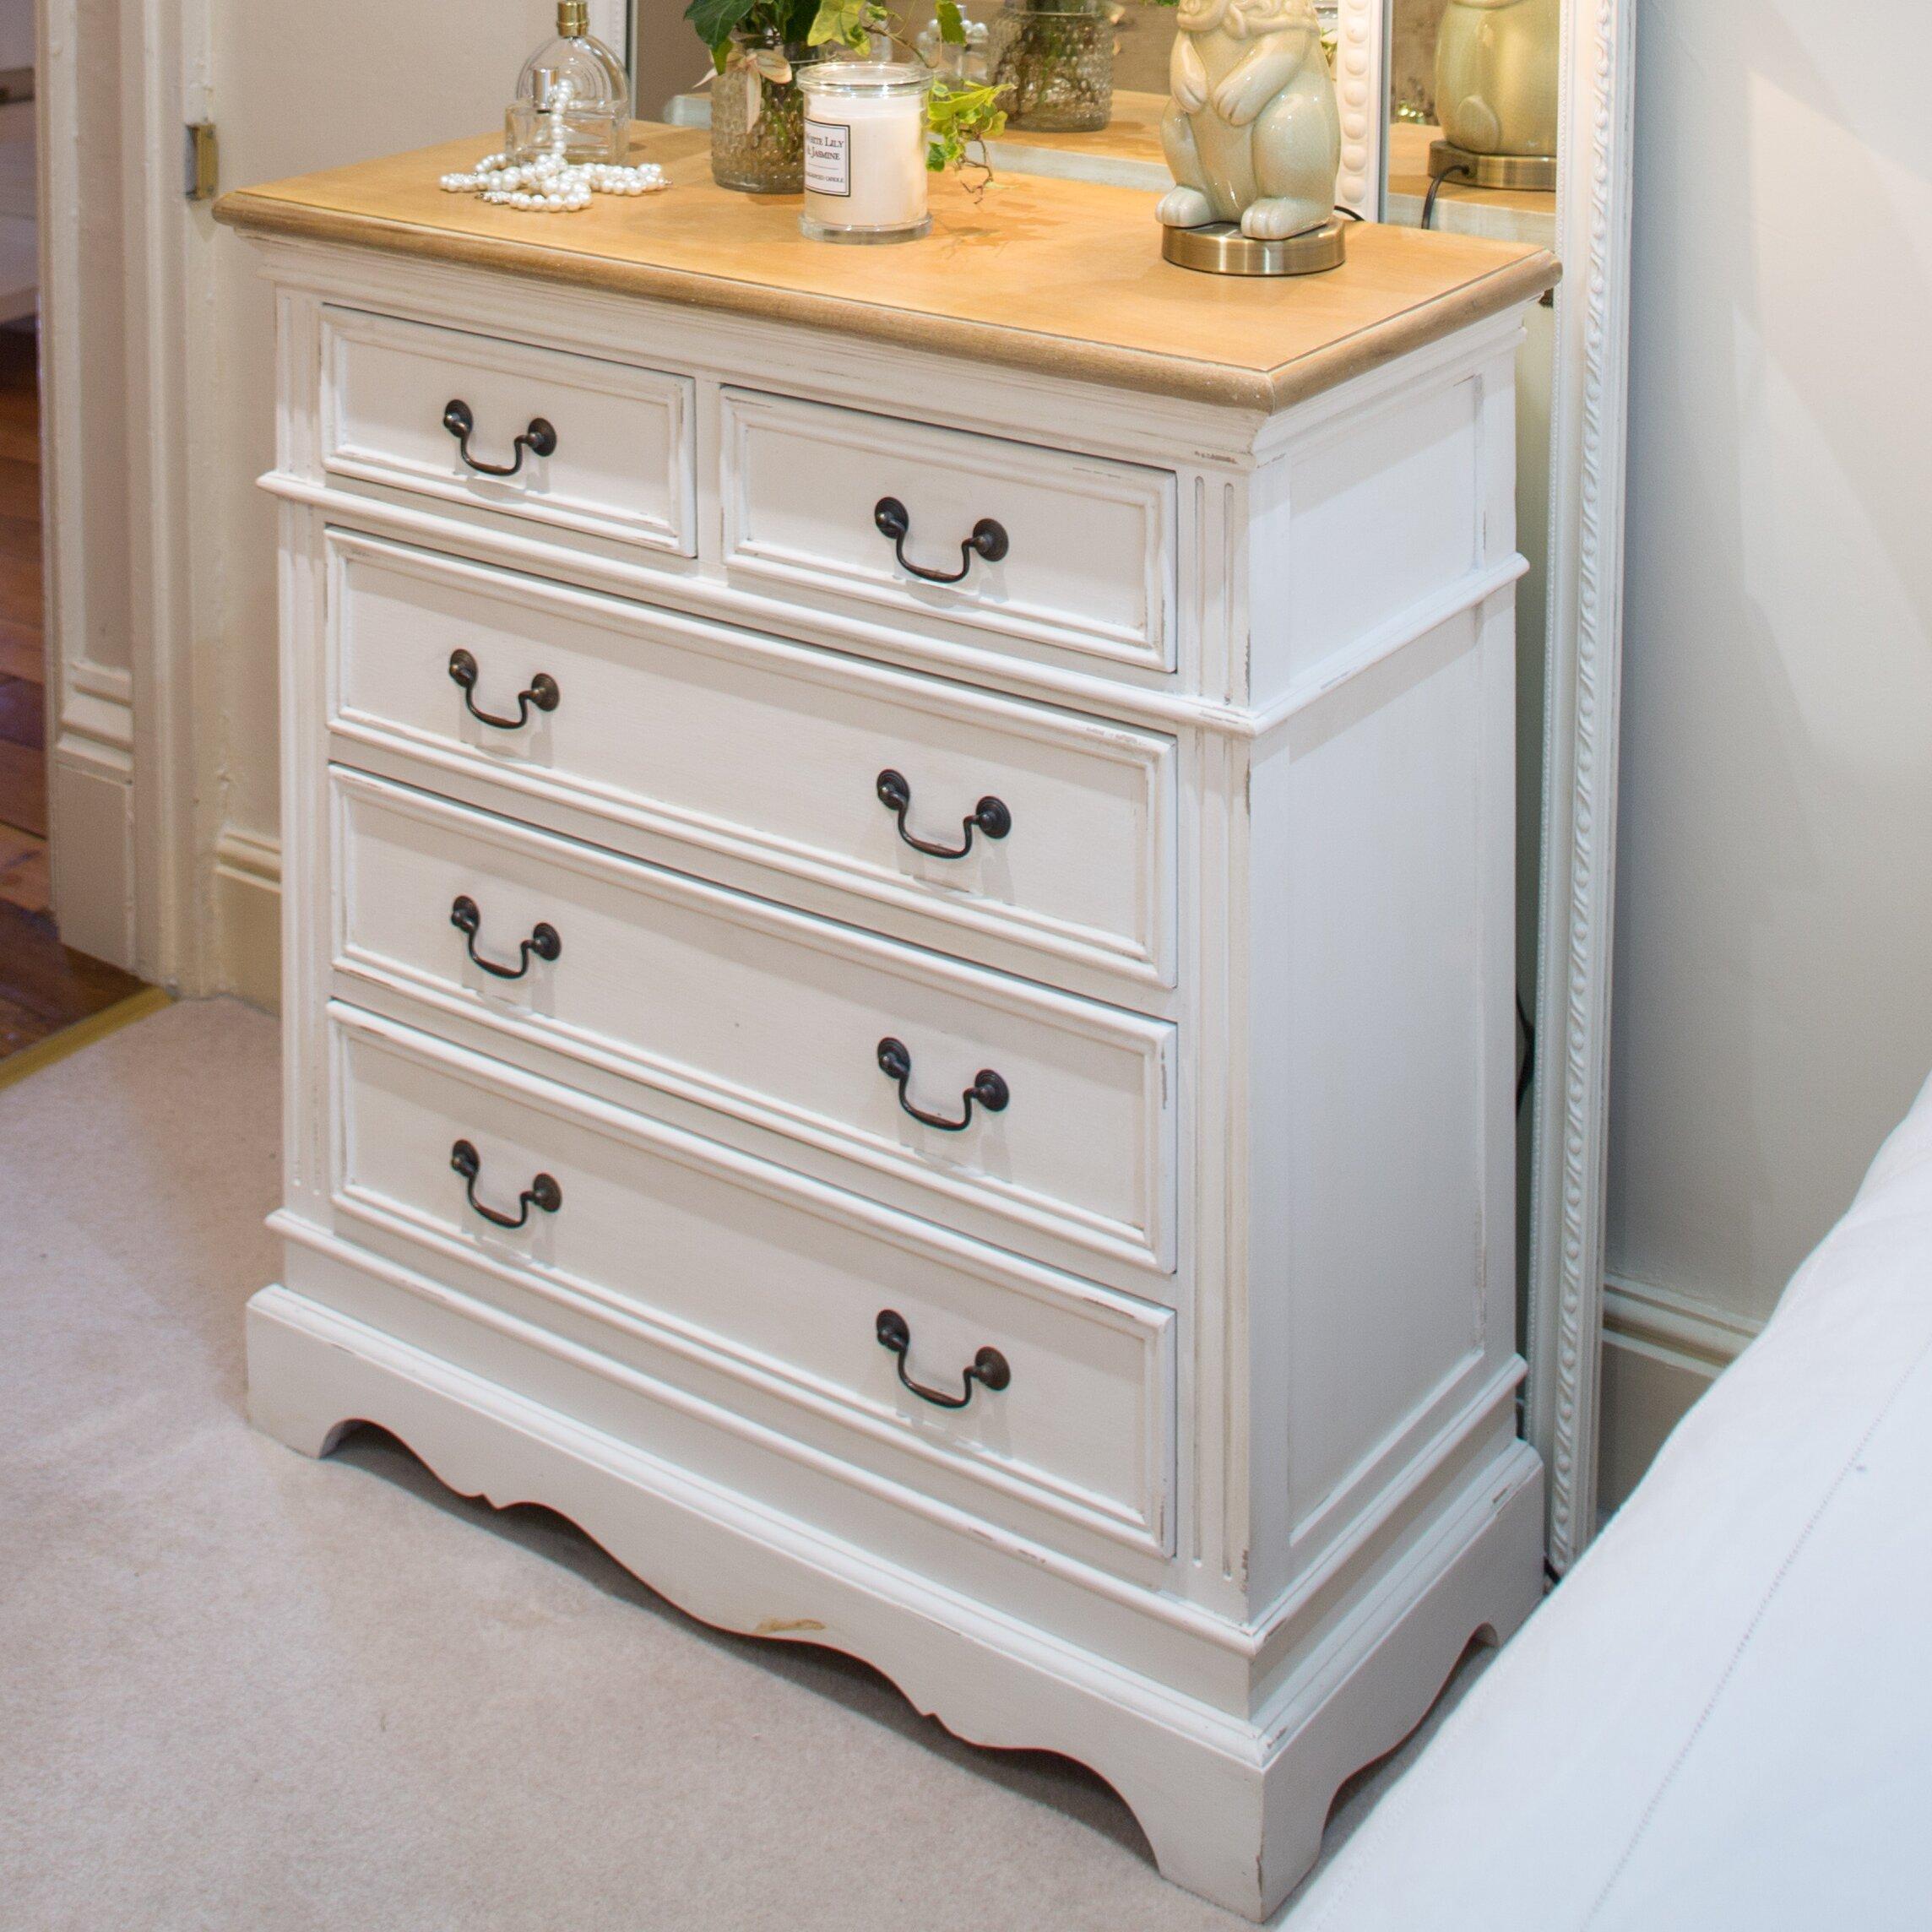 Maine Furniture Co Sebago 5 Drawer Chest Of Drawers Reviews Wayfair Uk